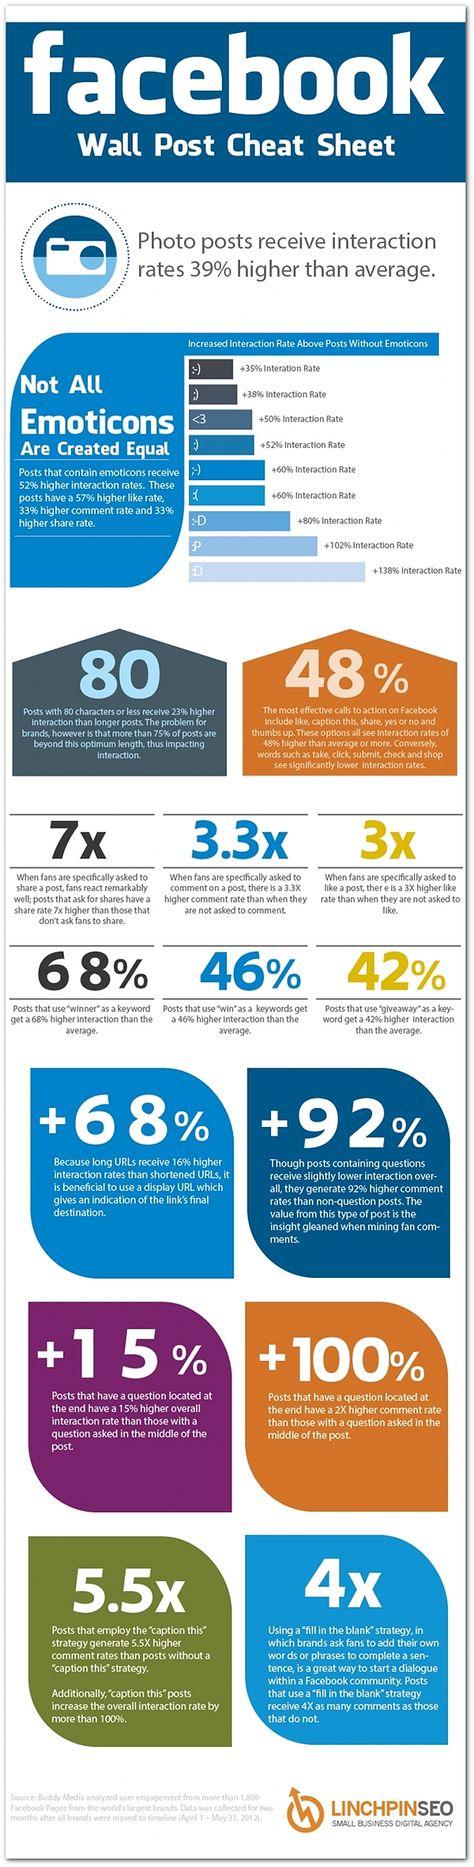 Linchpin Blog: Agile Marketing Strategies & Expert Business Insights